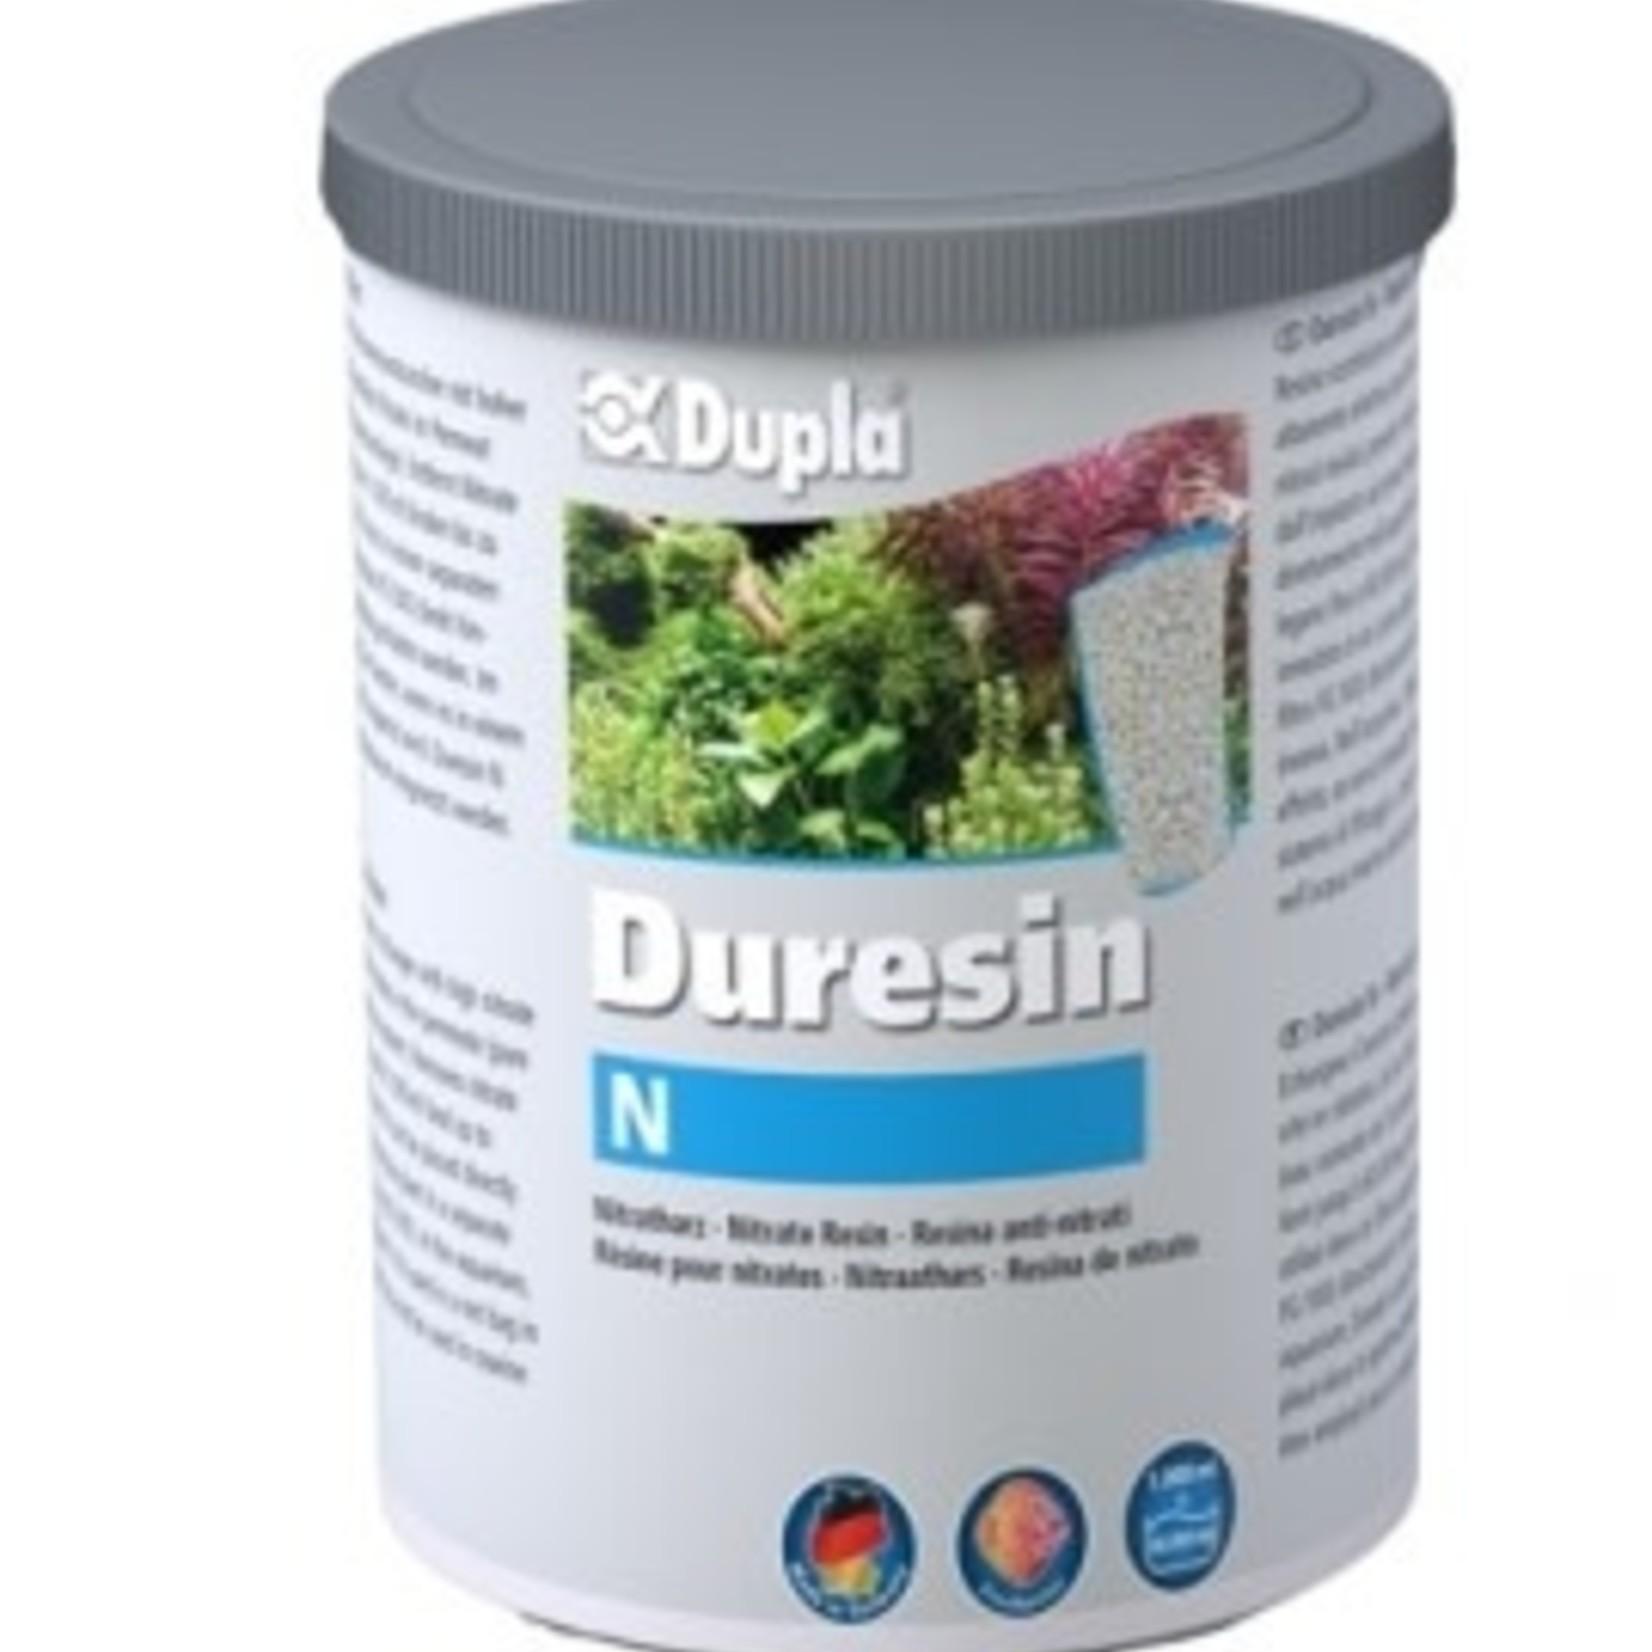 Dupla Duresin N 1000ml DUPLA (resine pour nitrates)